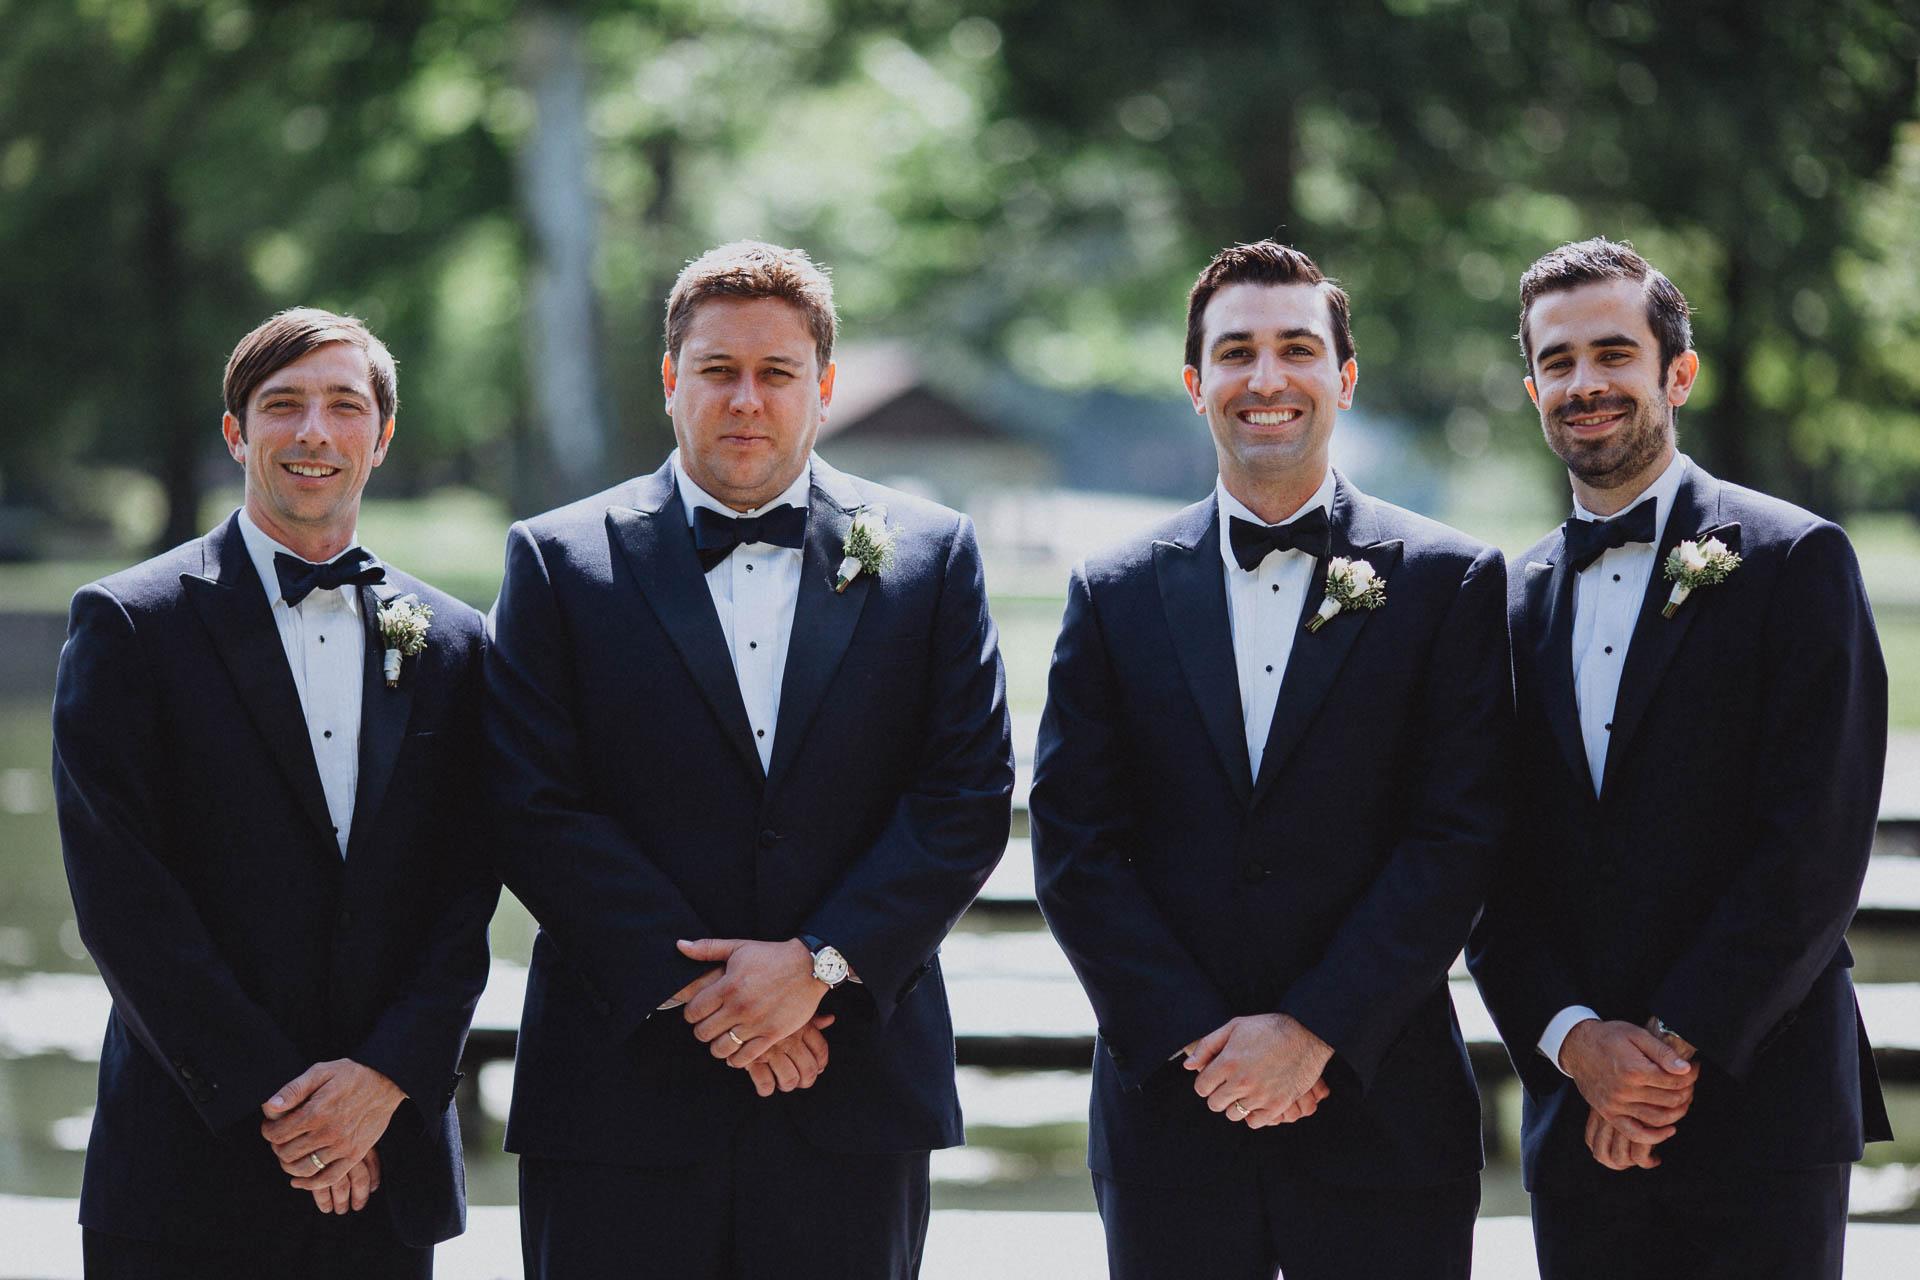 Keri-Joseph-Top-of-the-Market-Wedding-099@2x.jpg